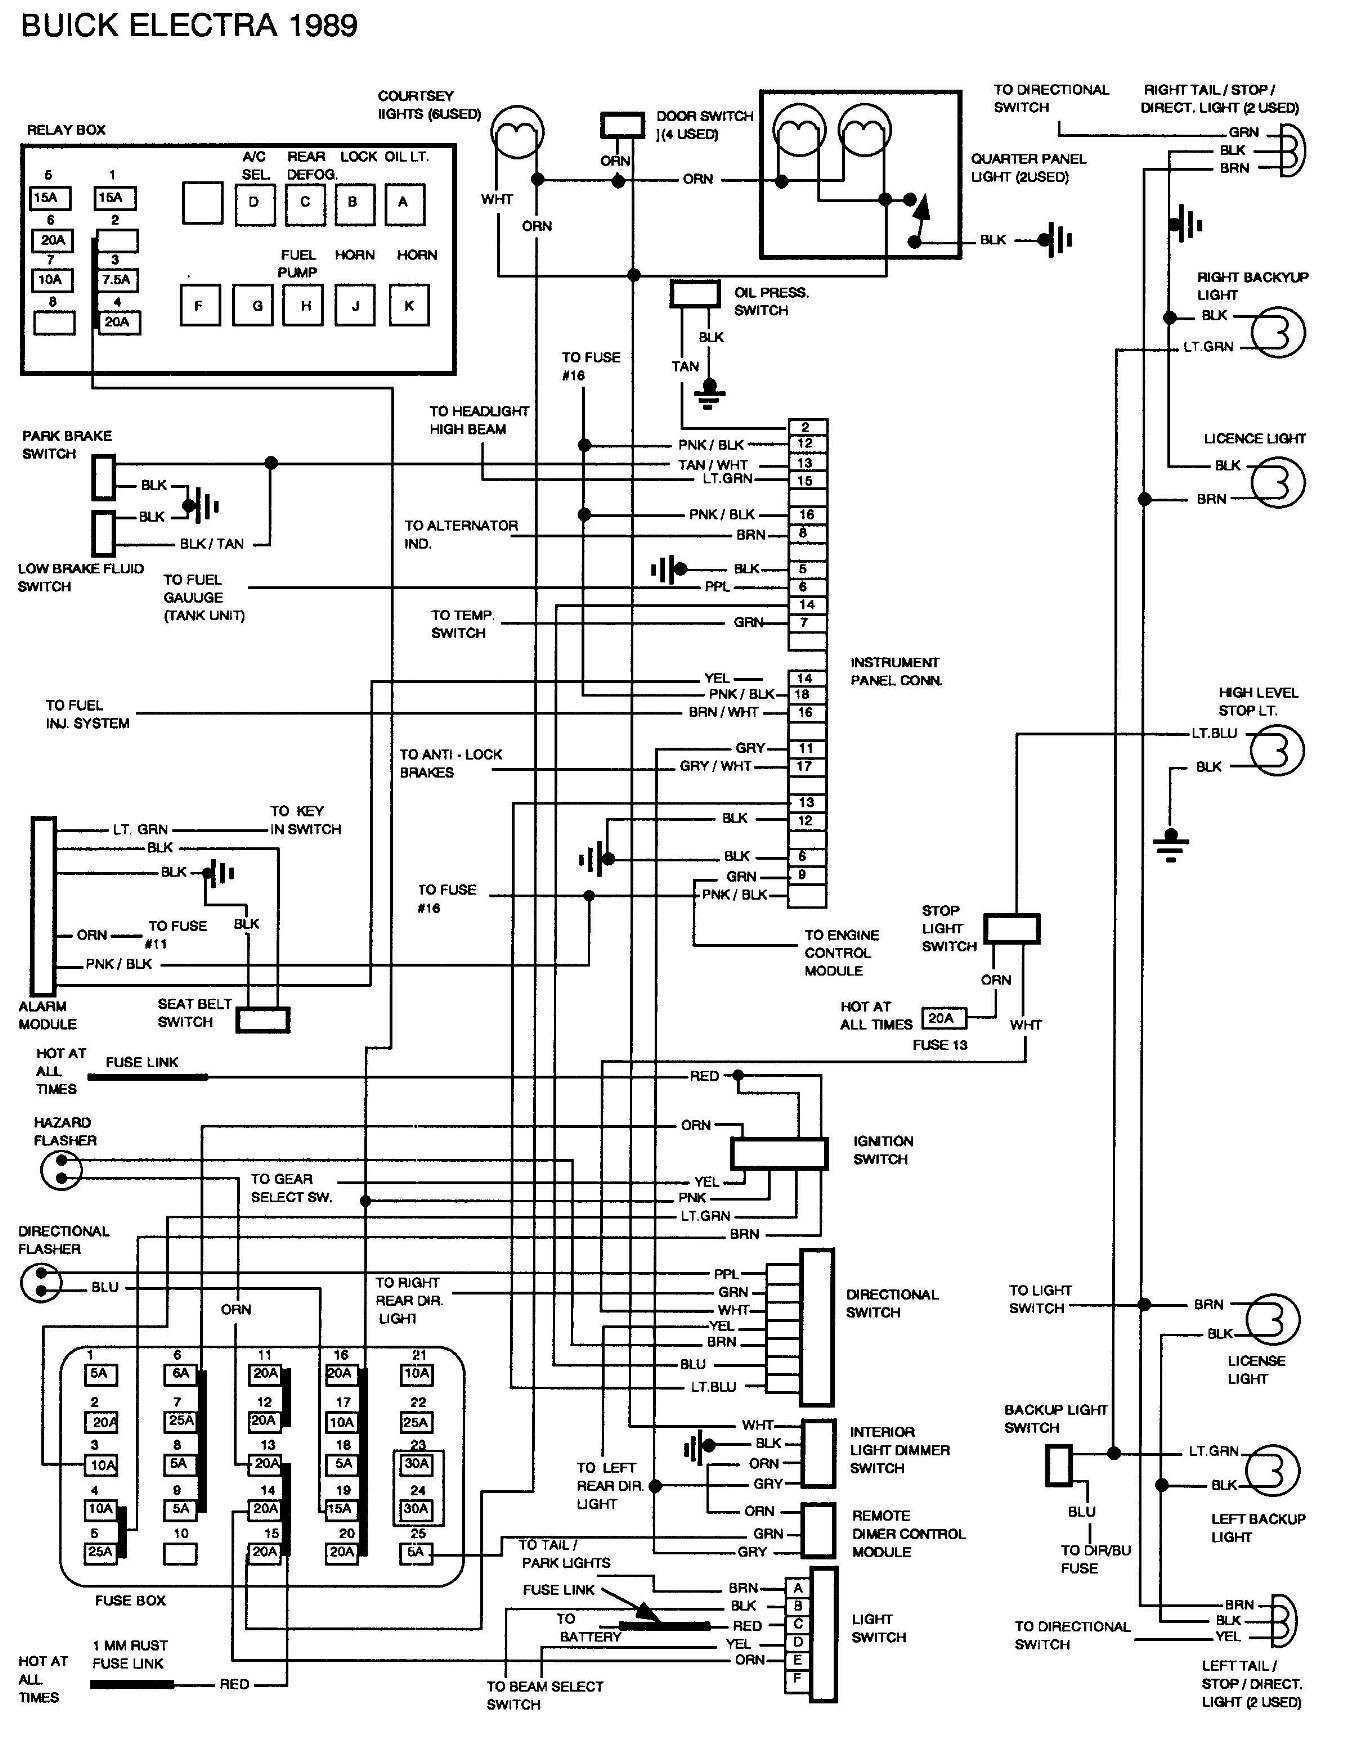 2001 Buick Lesabre Engine Diagram 2003 Buick Lesabre Radio